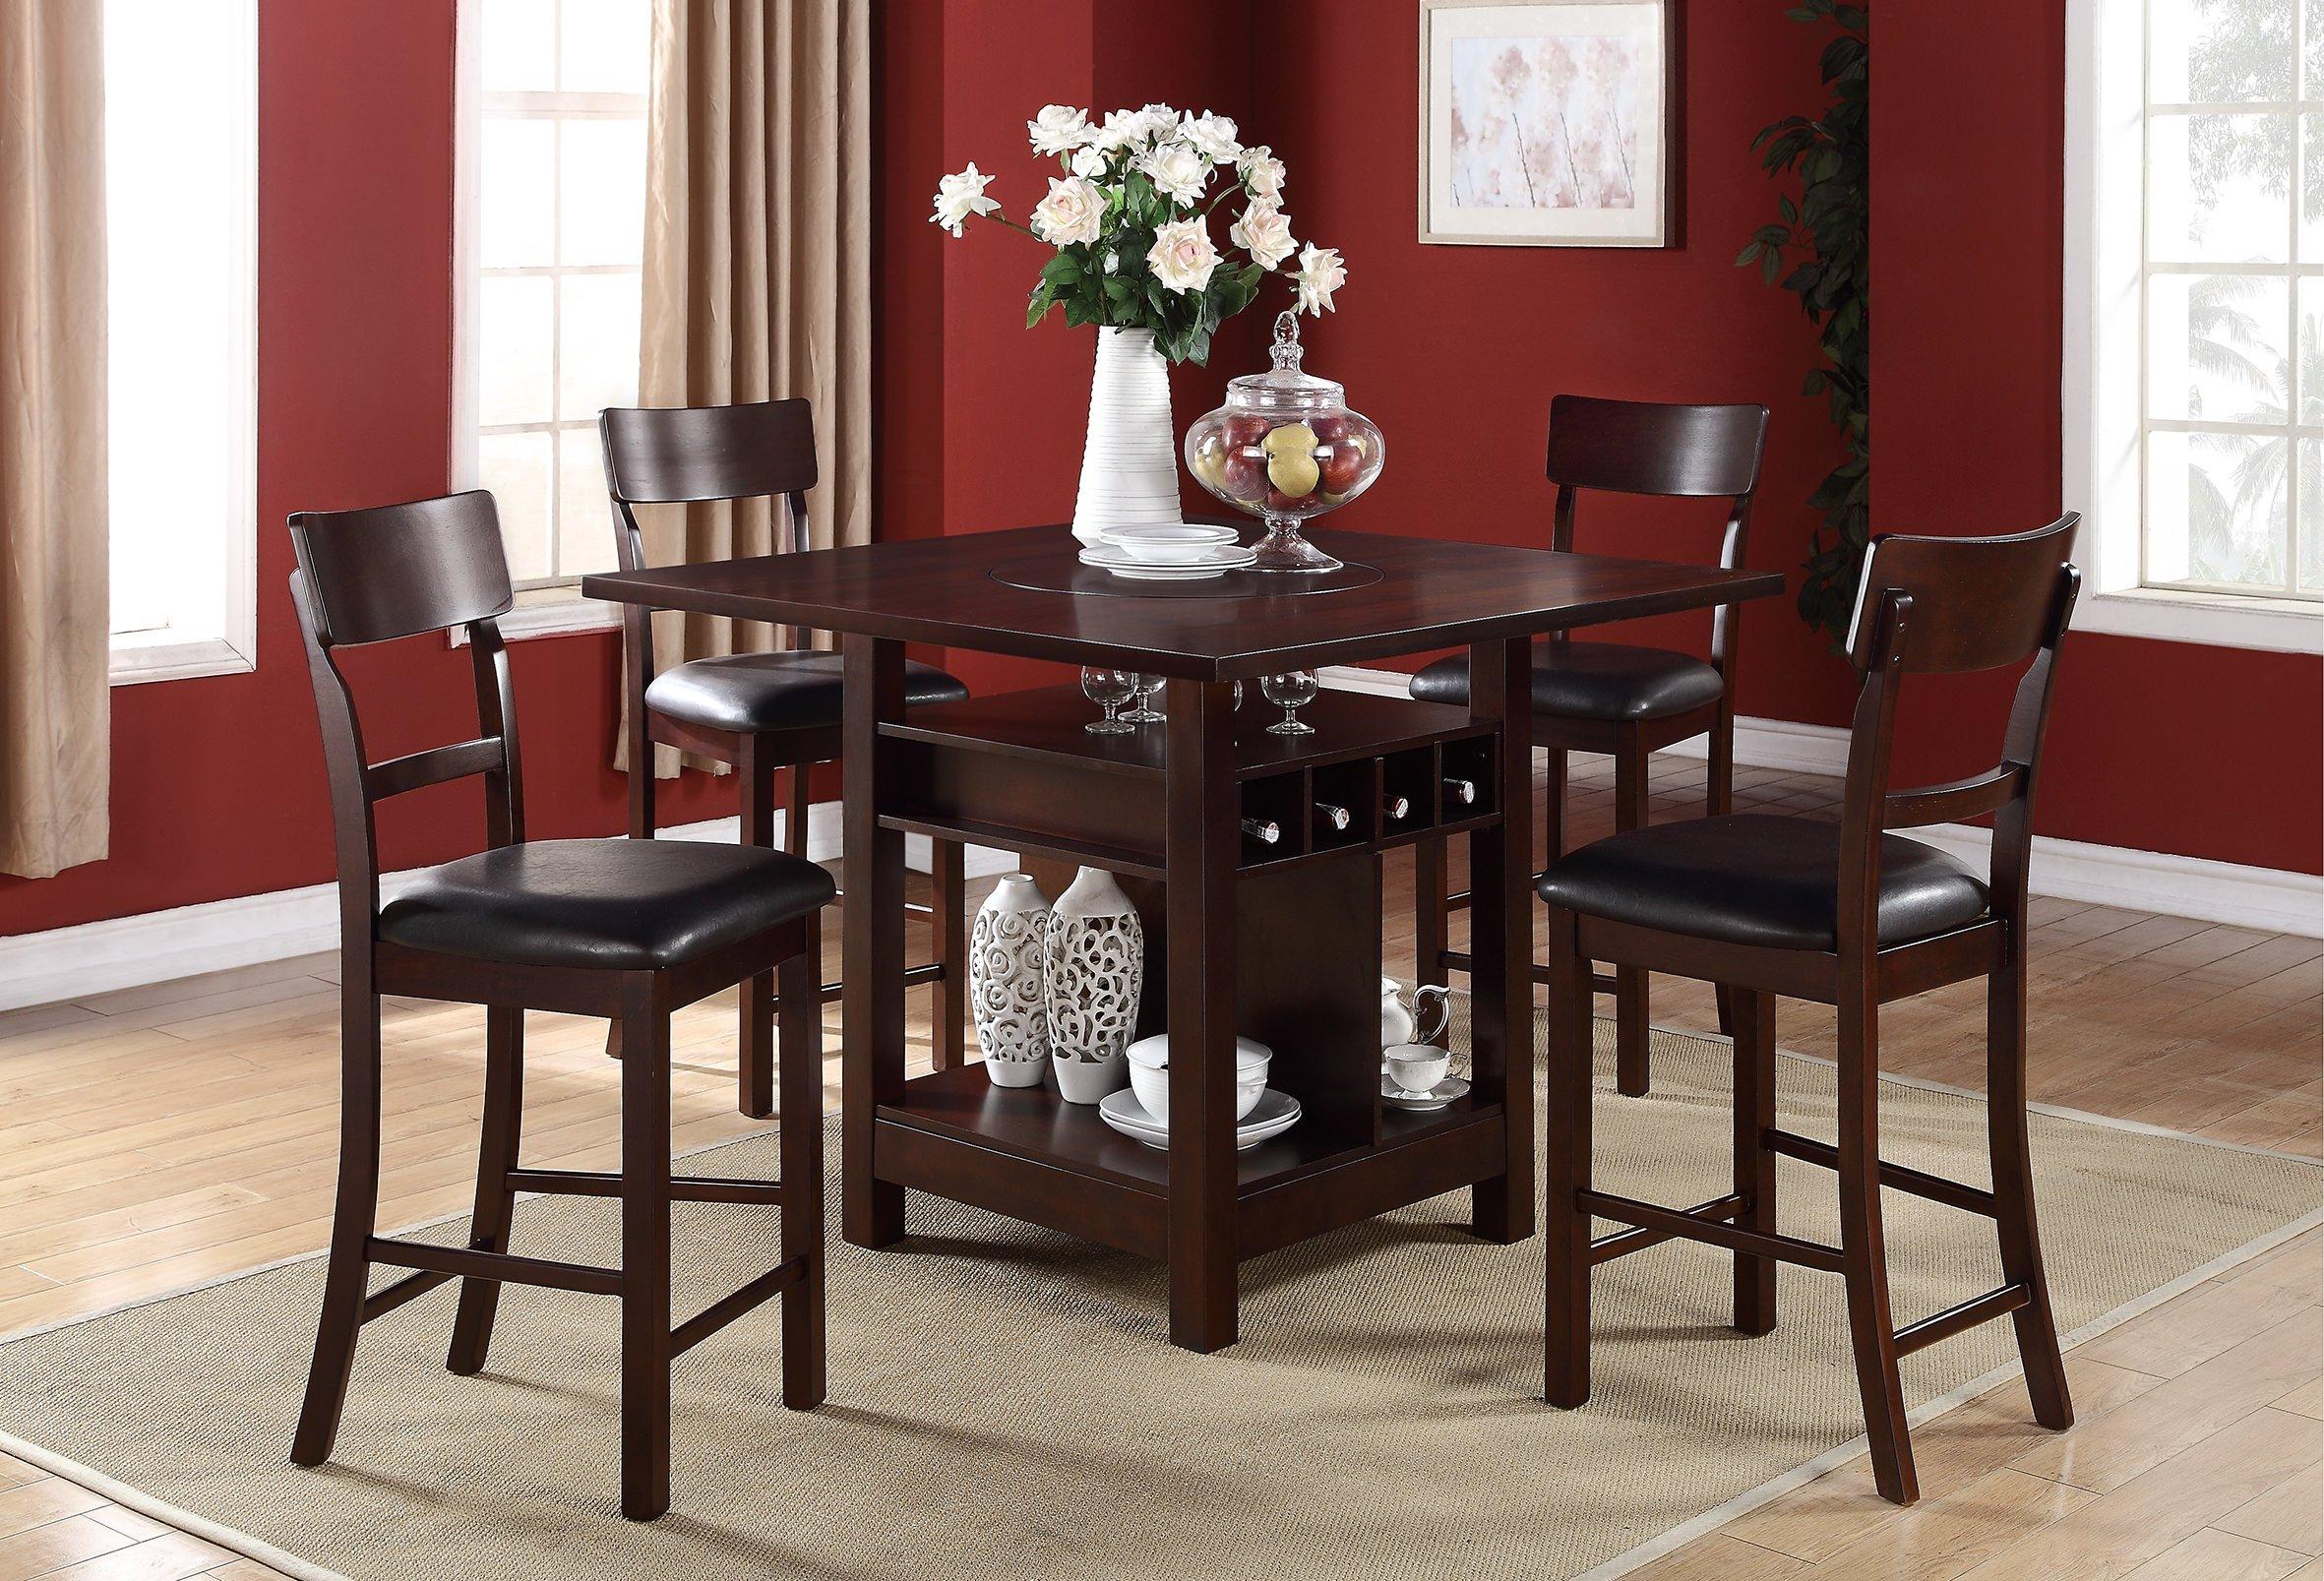 F1207 Dark Chocolate High Chair by Poundex : F2347 from futonland.com size 2362 x 1607 jpeg 943kB